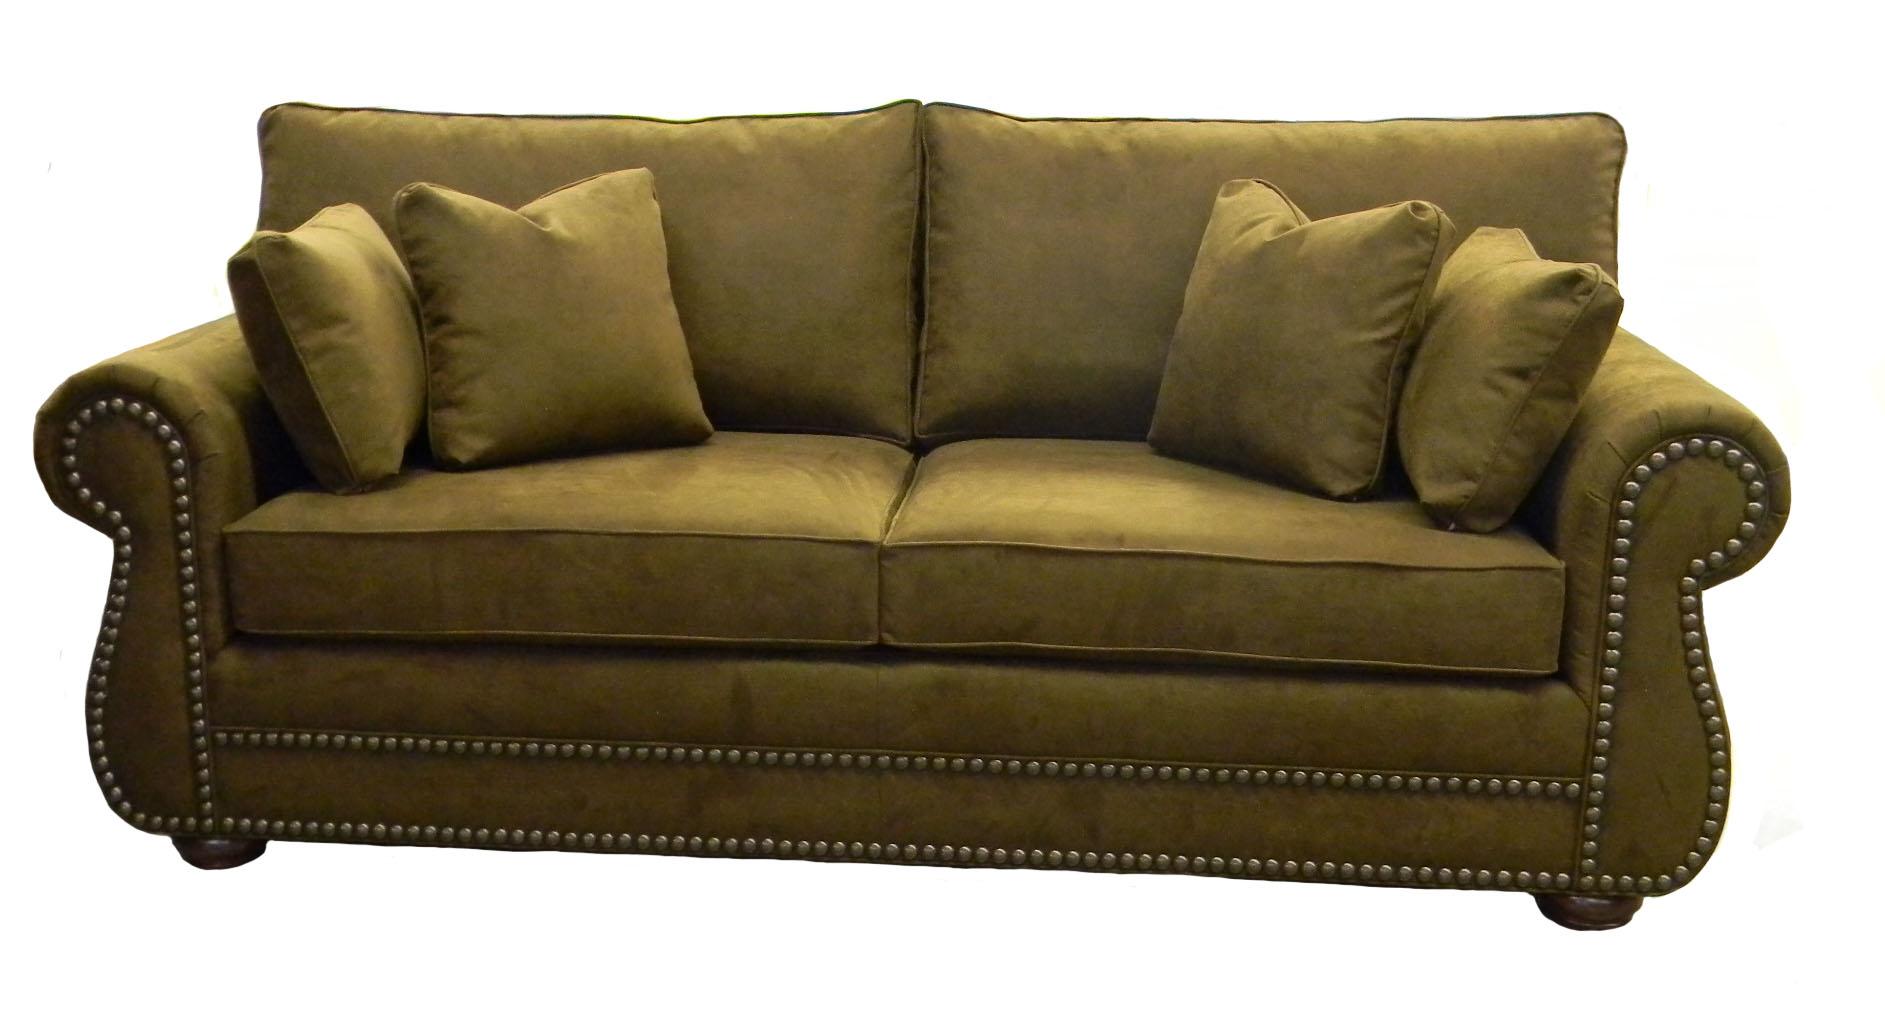 usa made sleeper sofa urban barn bed reviews kingsley queen carolina chair american